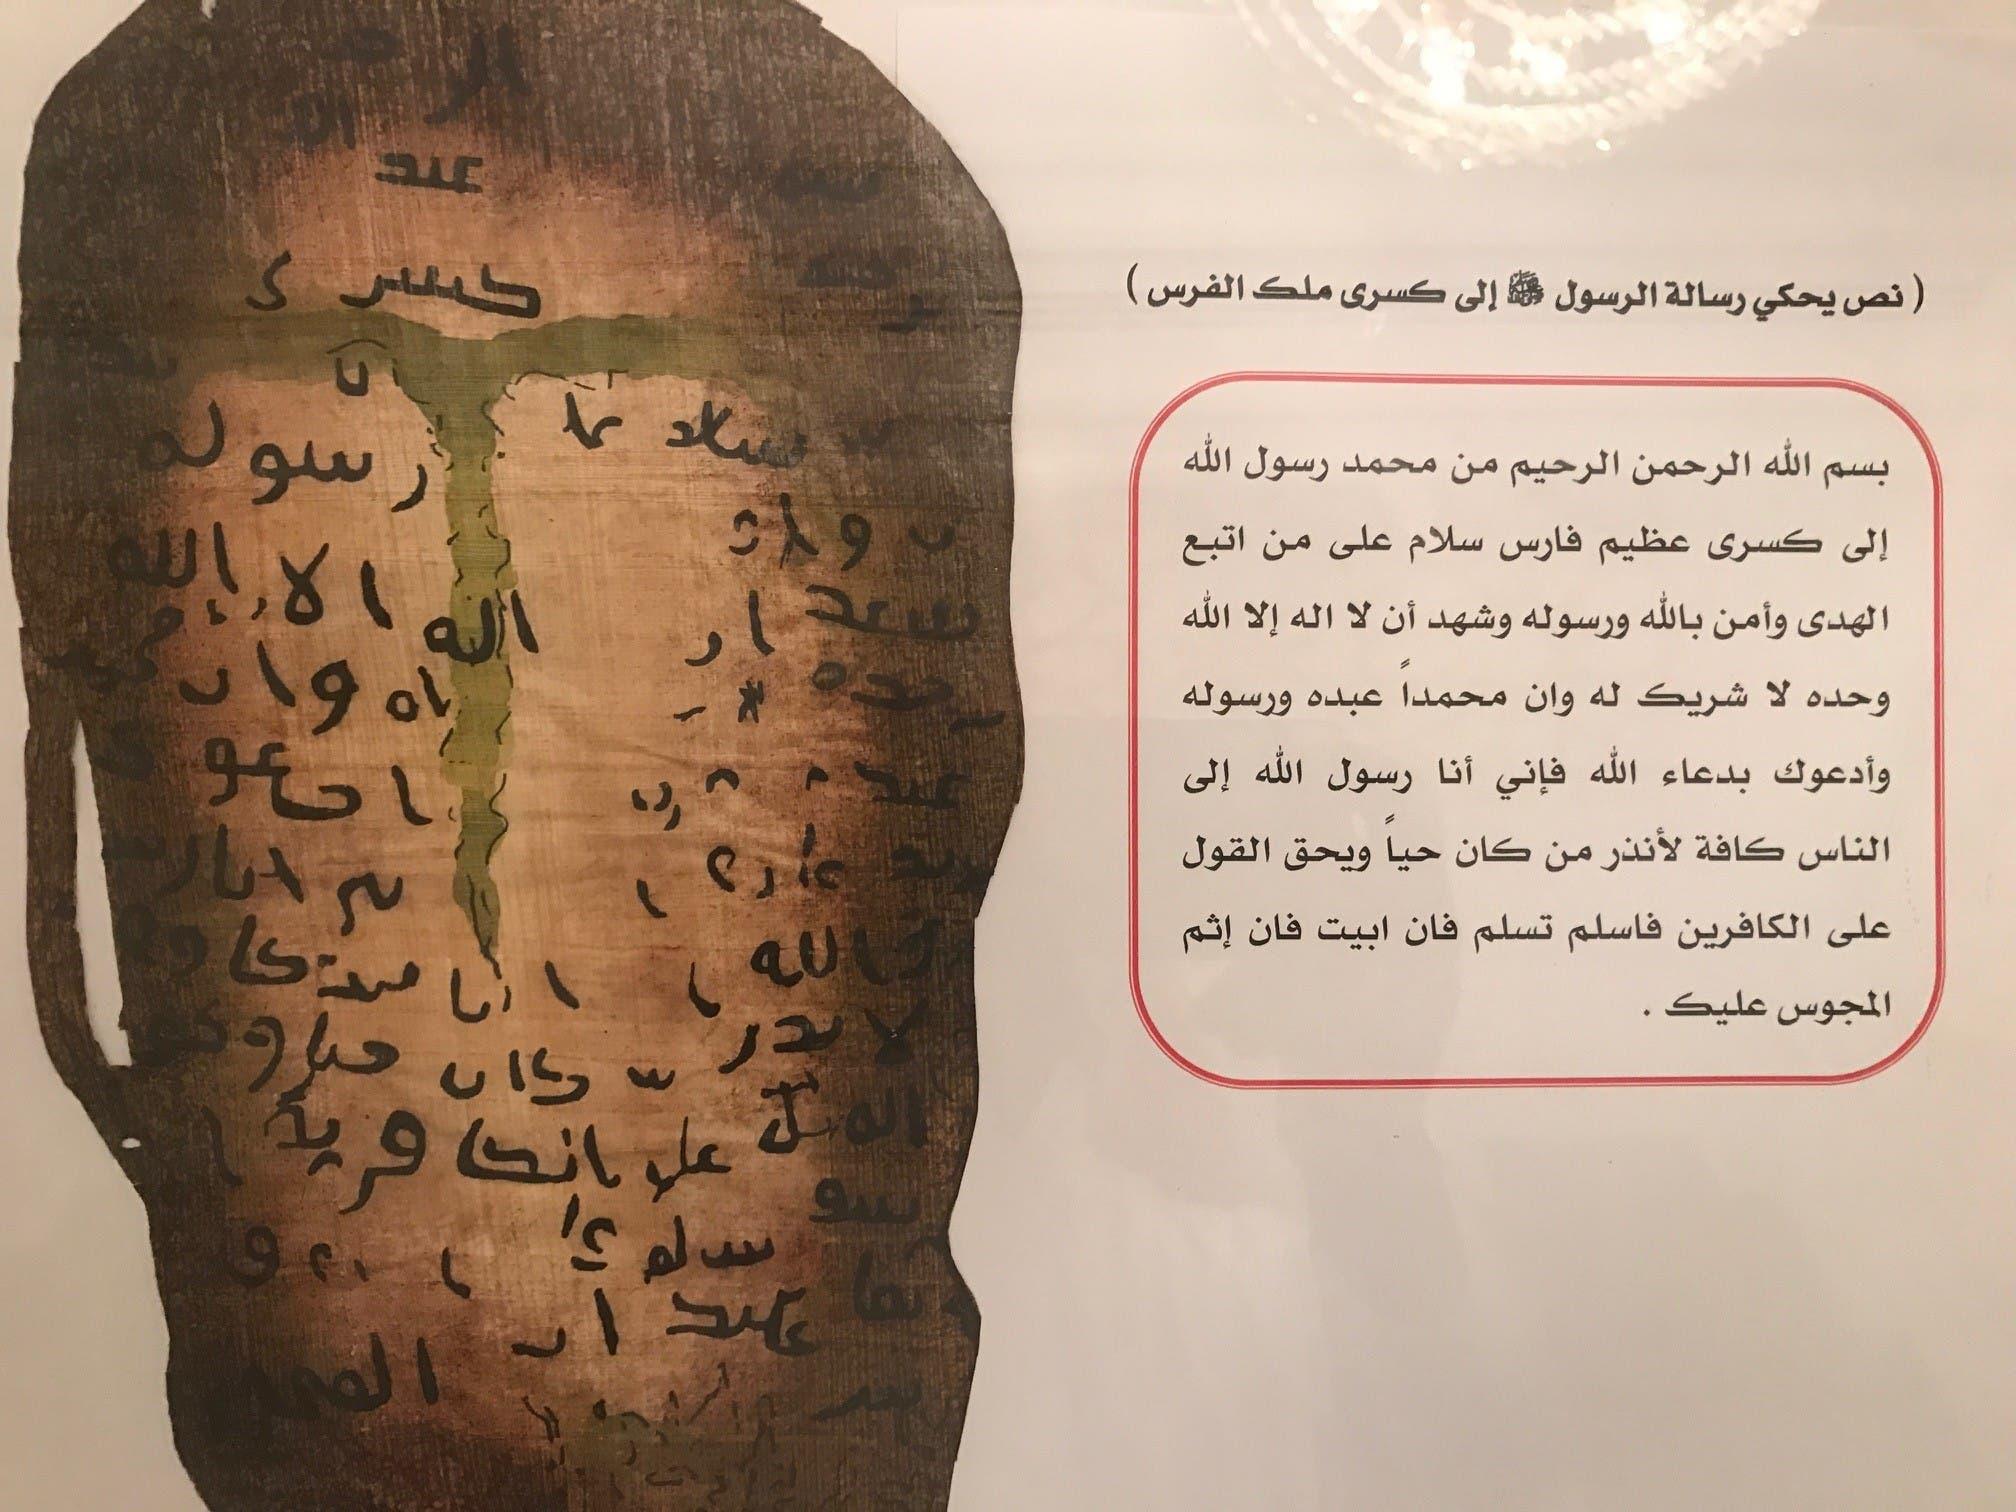 بالصور.. رسائل النبي محمد ملوك 478f31cc-ec08-4116-a